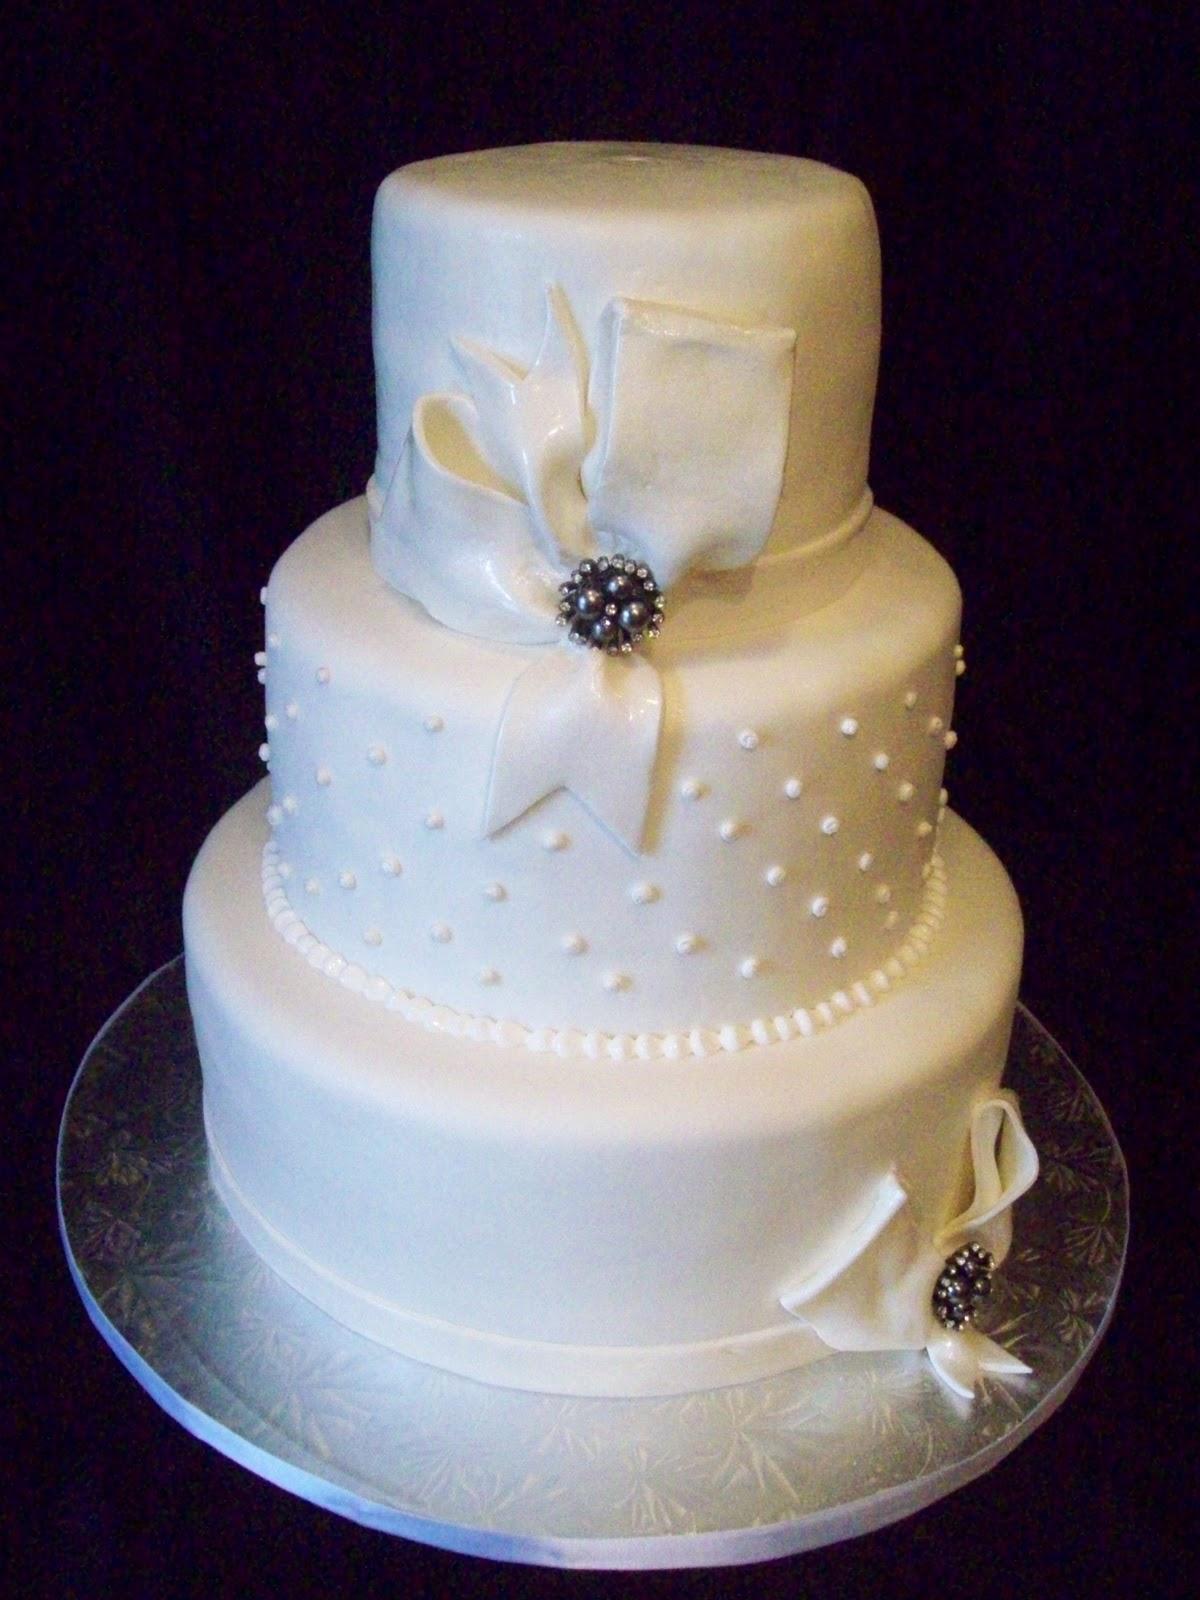 Brown Sugar Custom Cakes Anniversary Cake Shoe Cake and